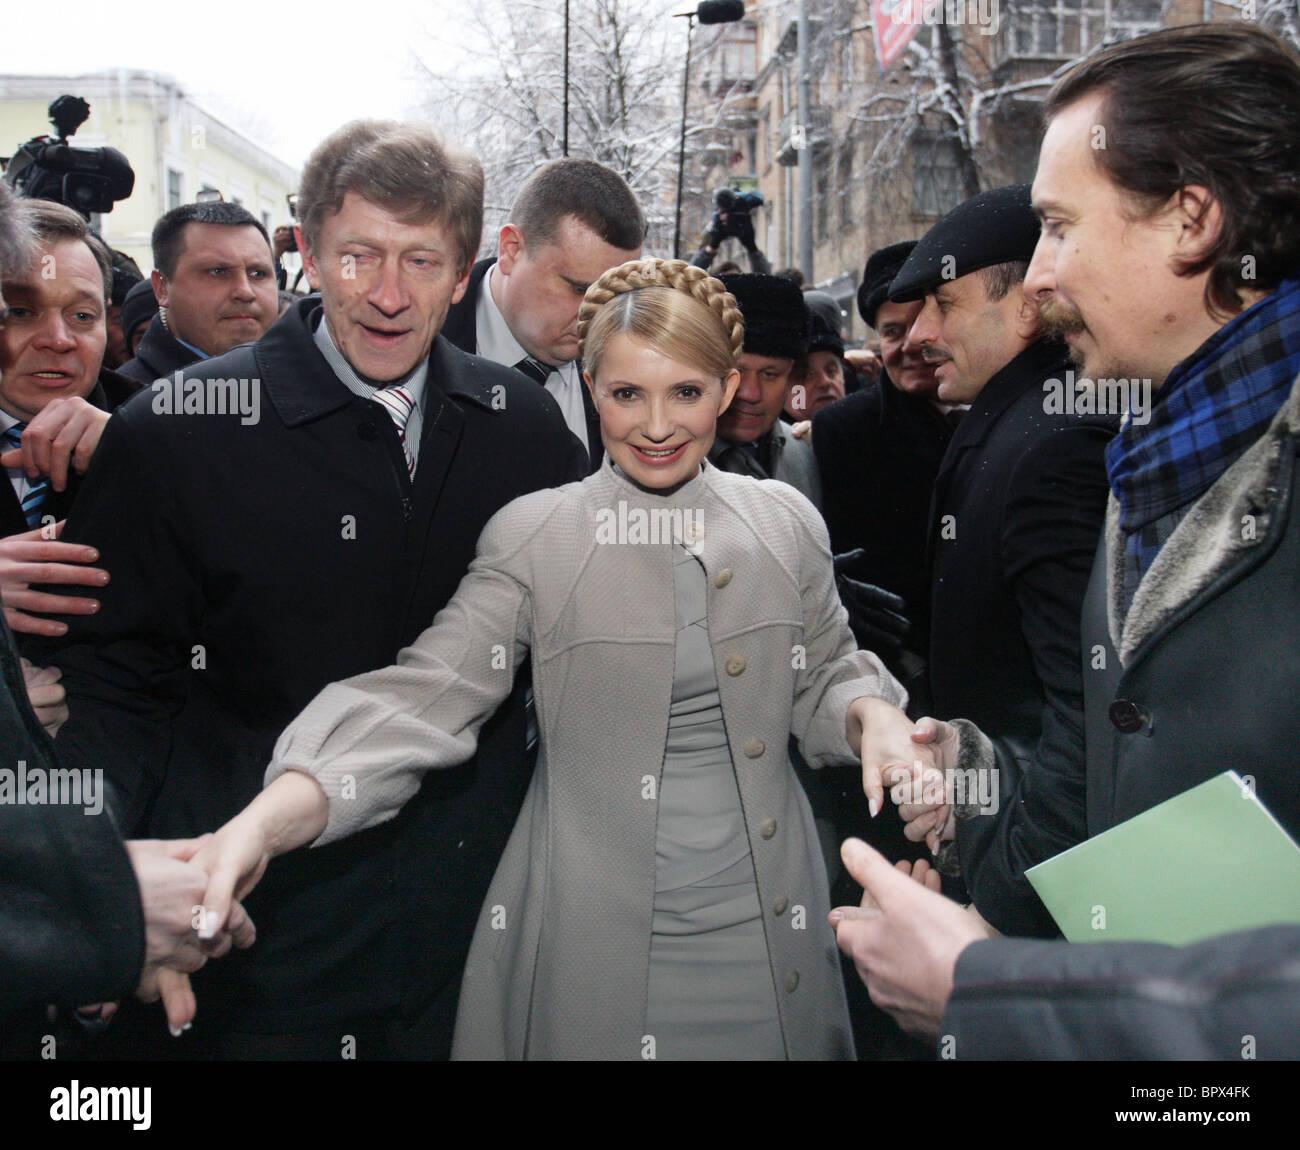 Tymoshenko challenges Ukraine presidential election result in court - Stock Image